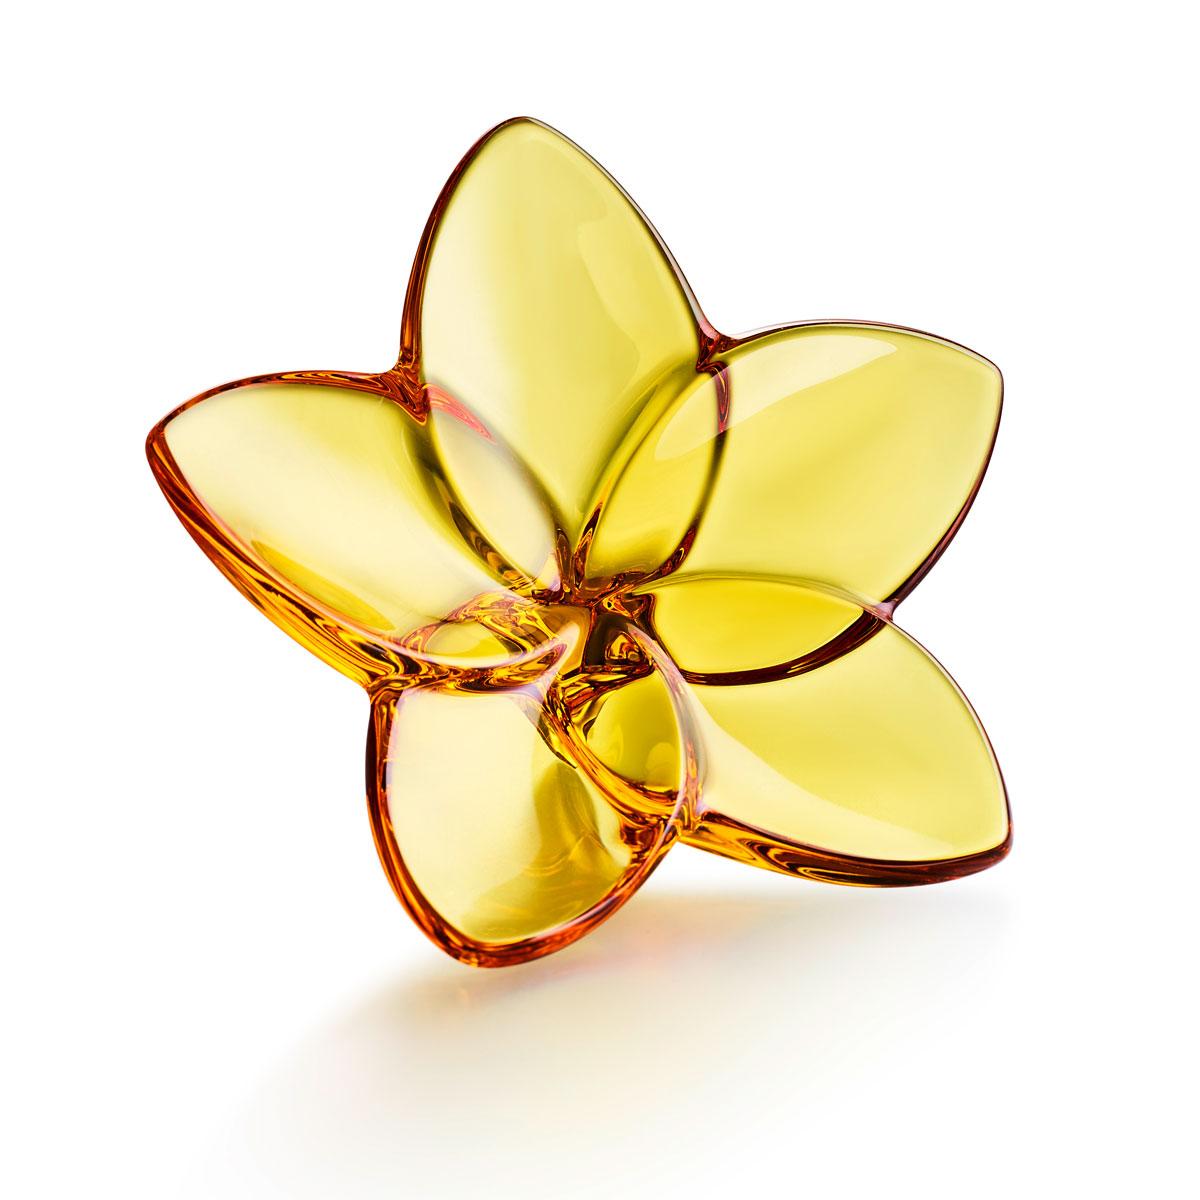 Baccarat Bloom Amber Flower Sculpture